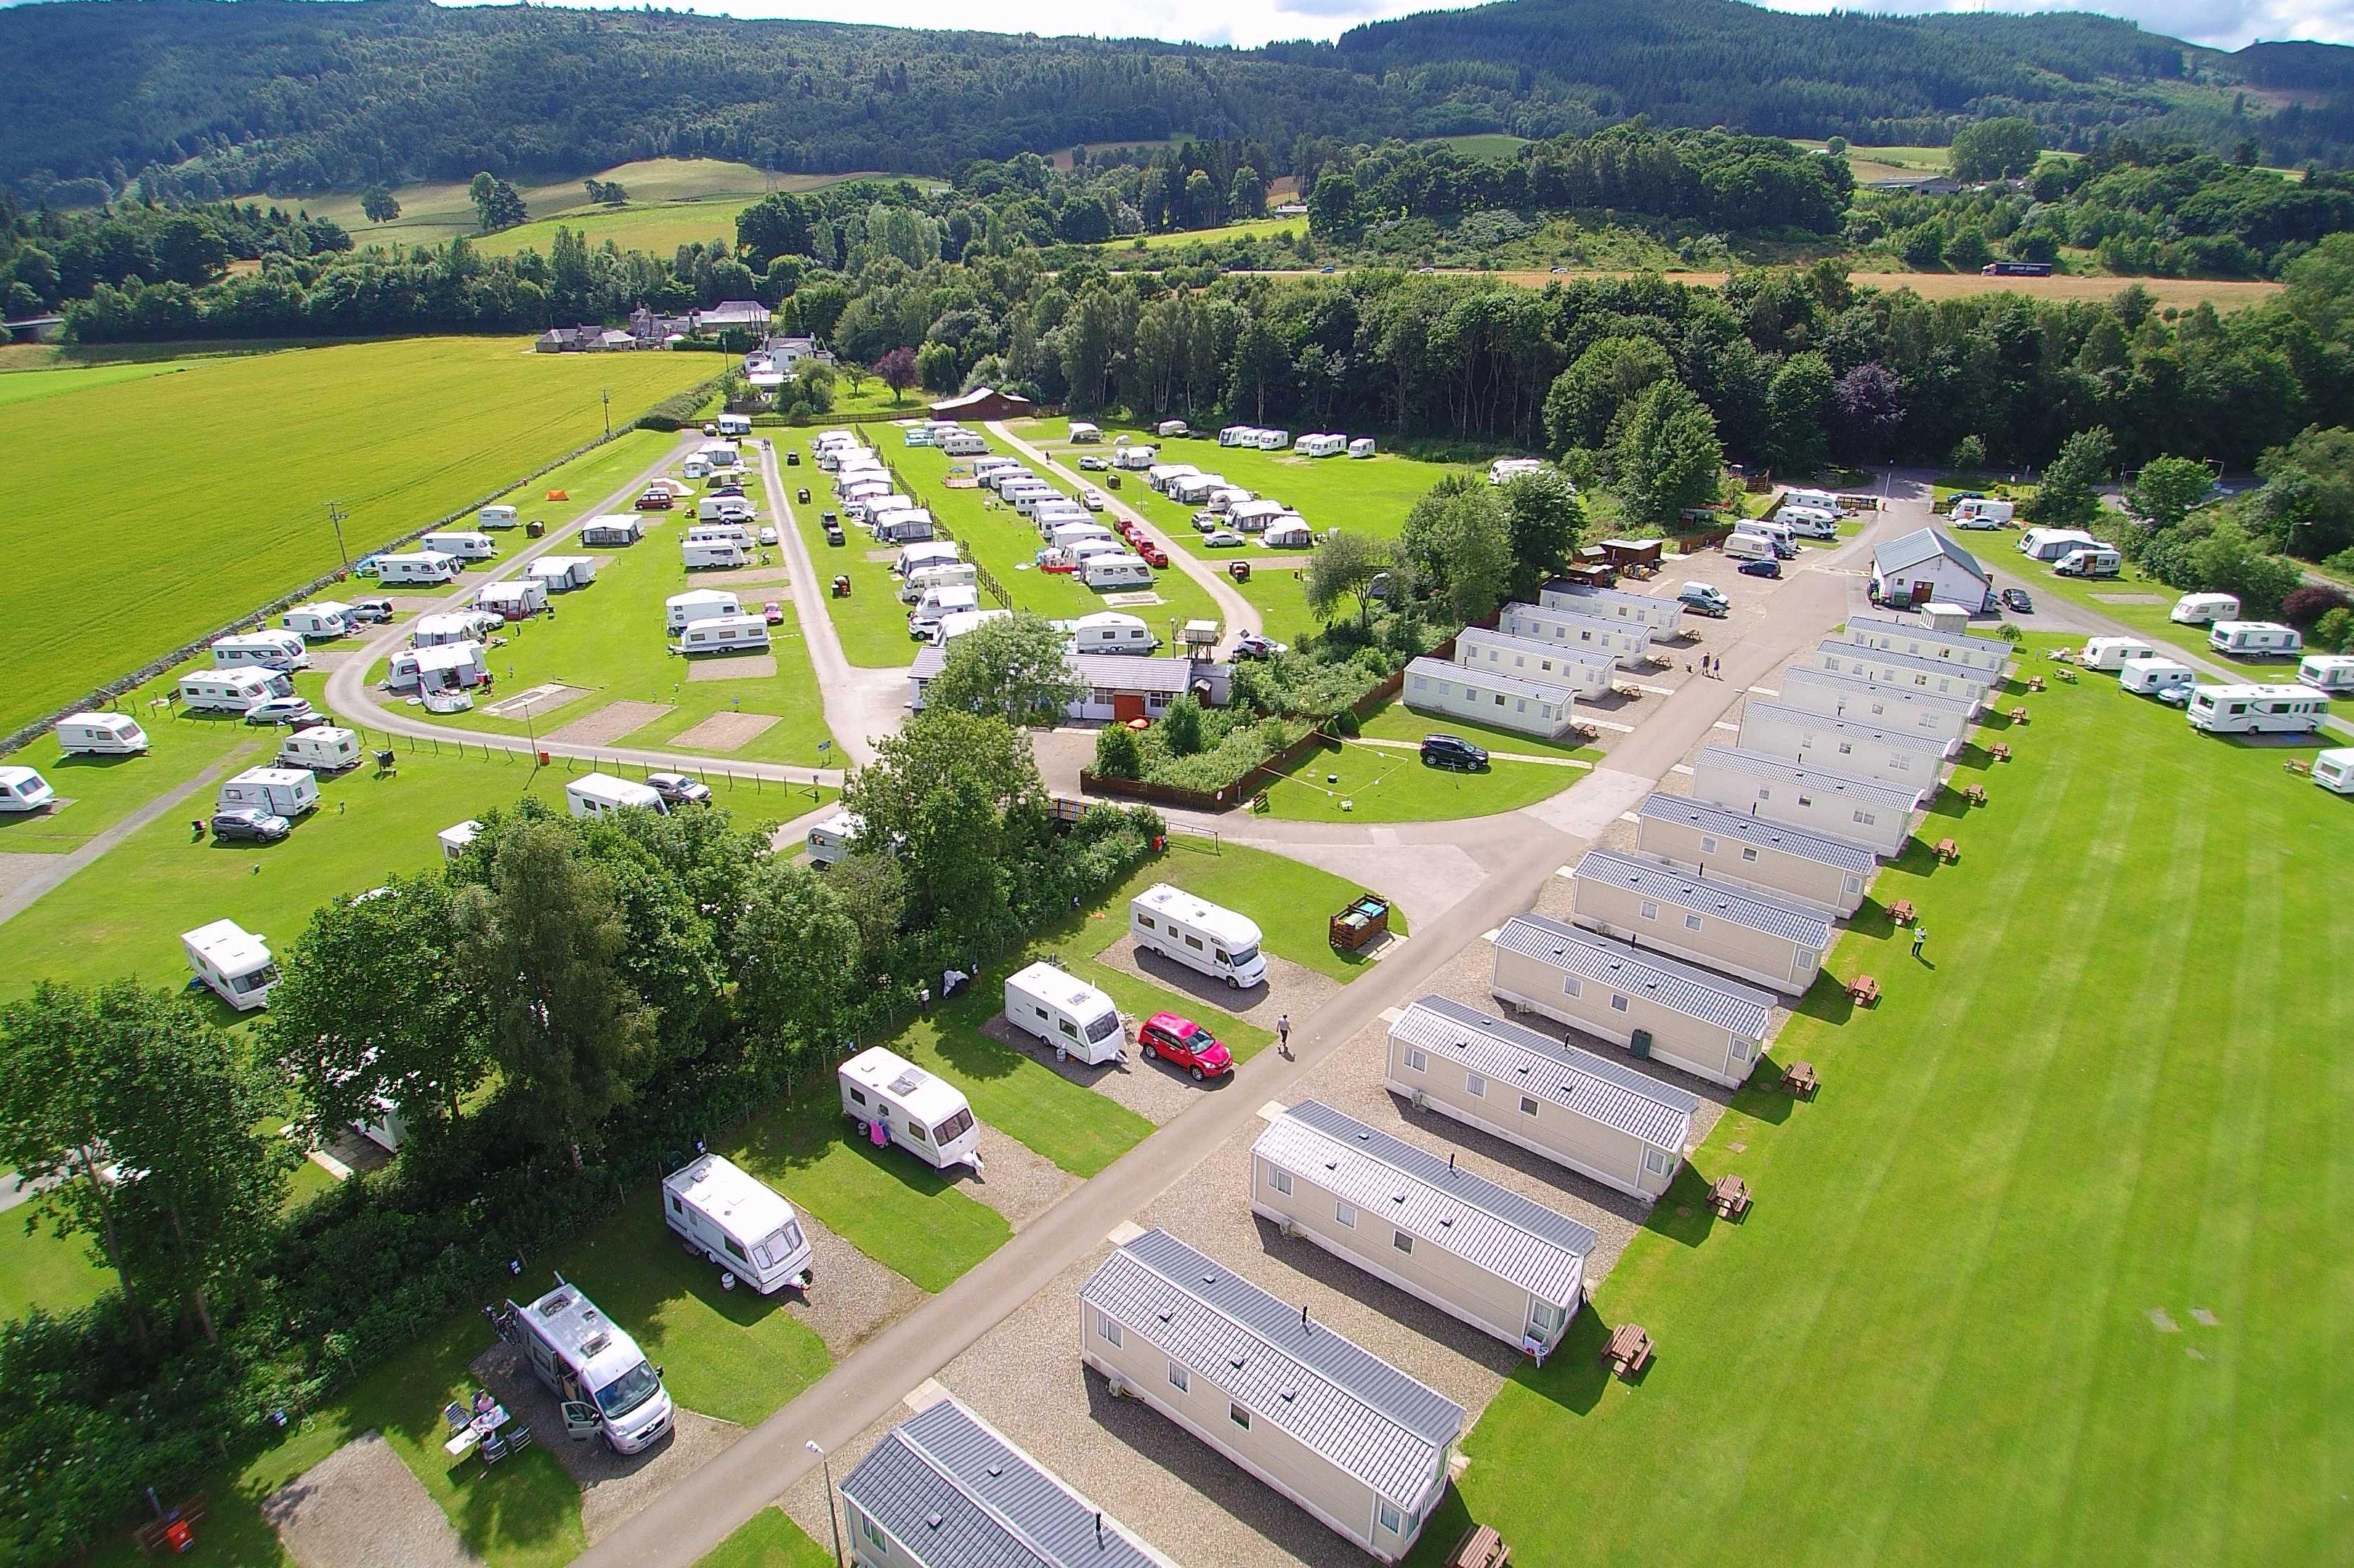 Camping In Schottland Finde Die Top Campingplätze Pincamp By Adac